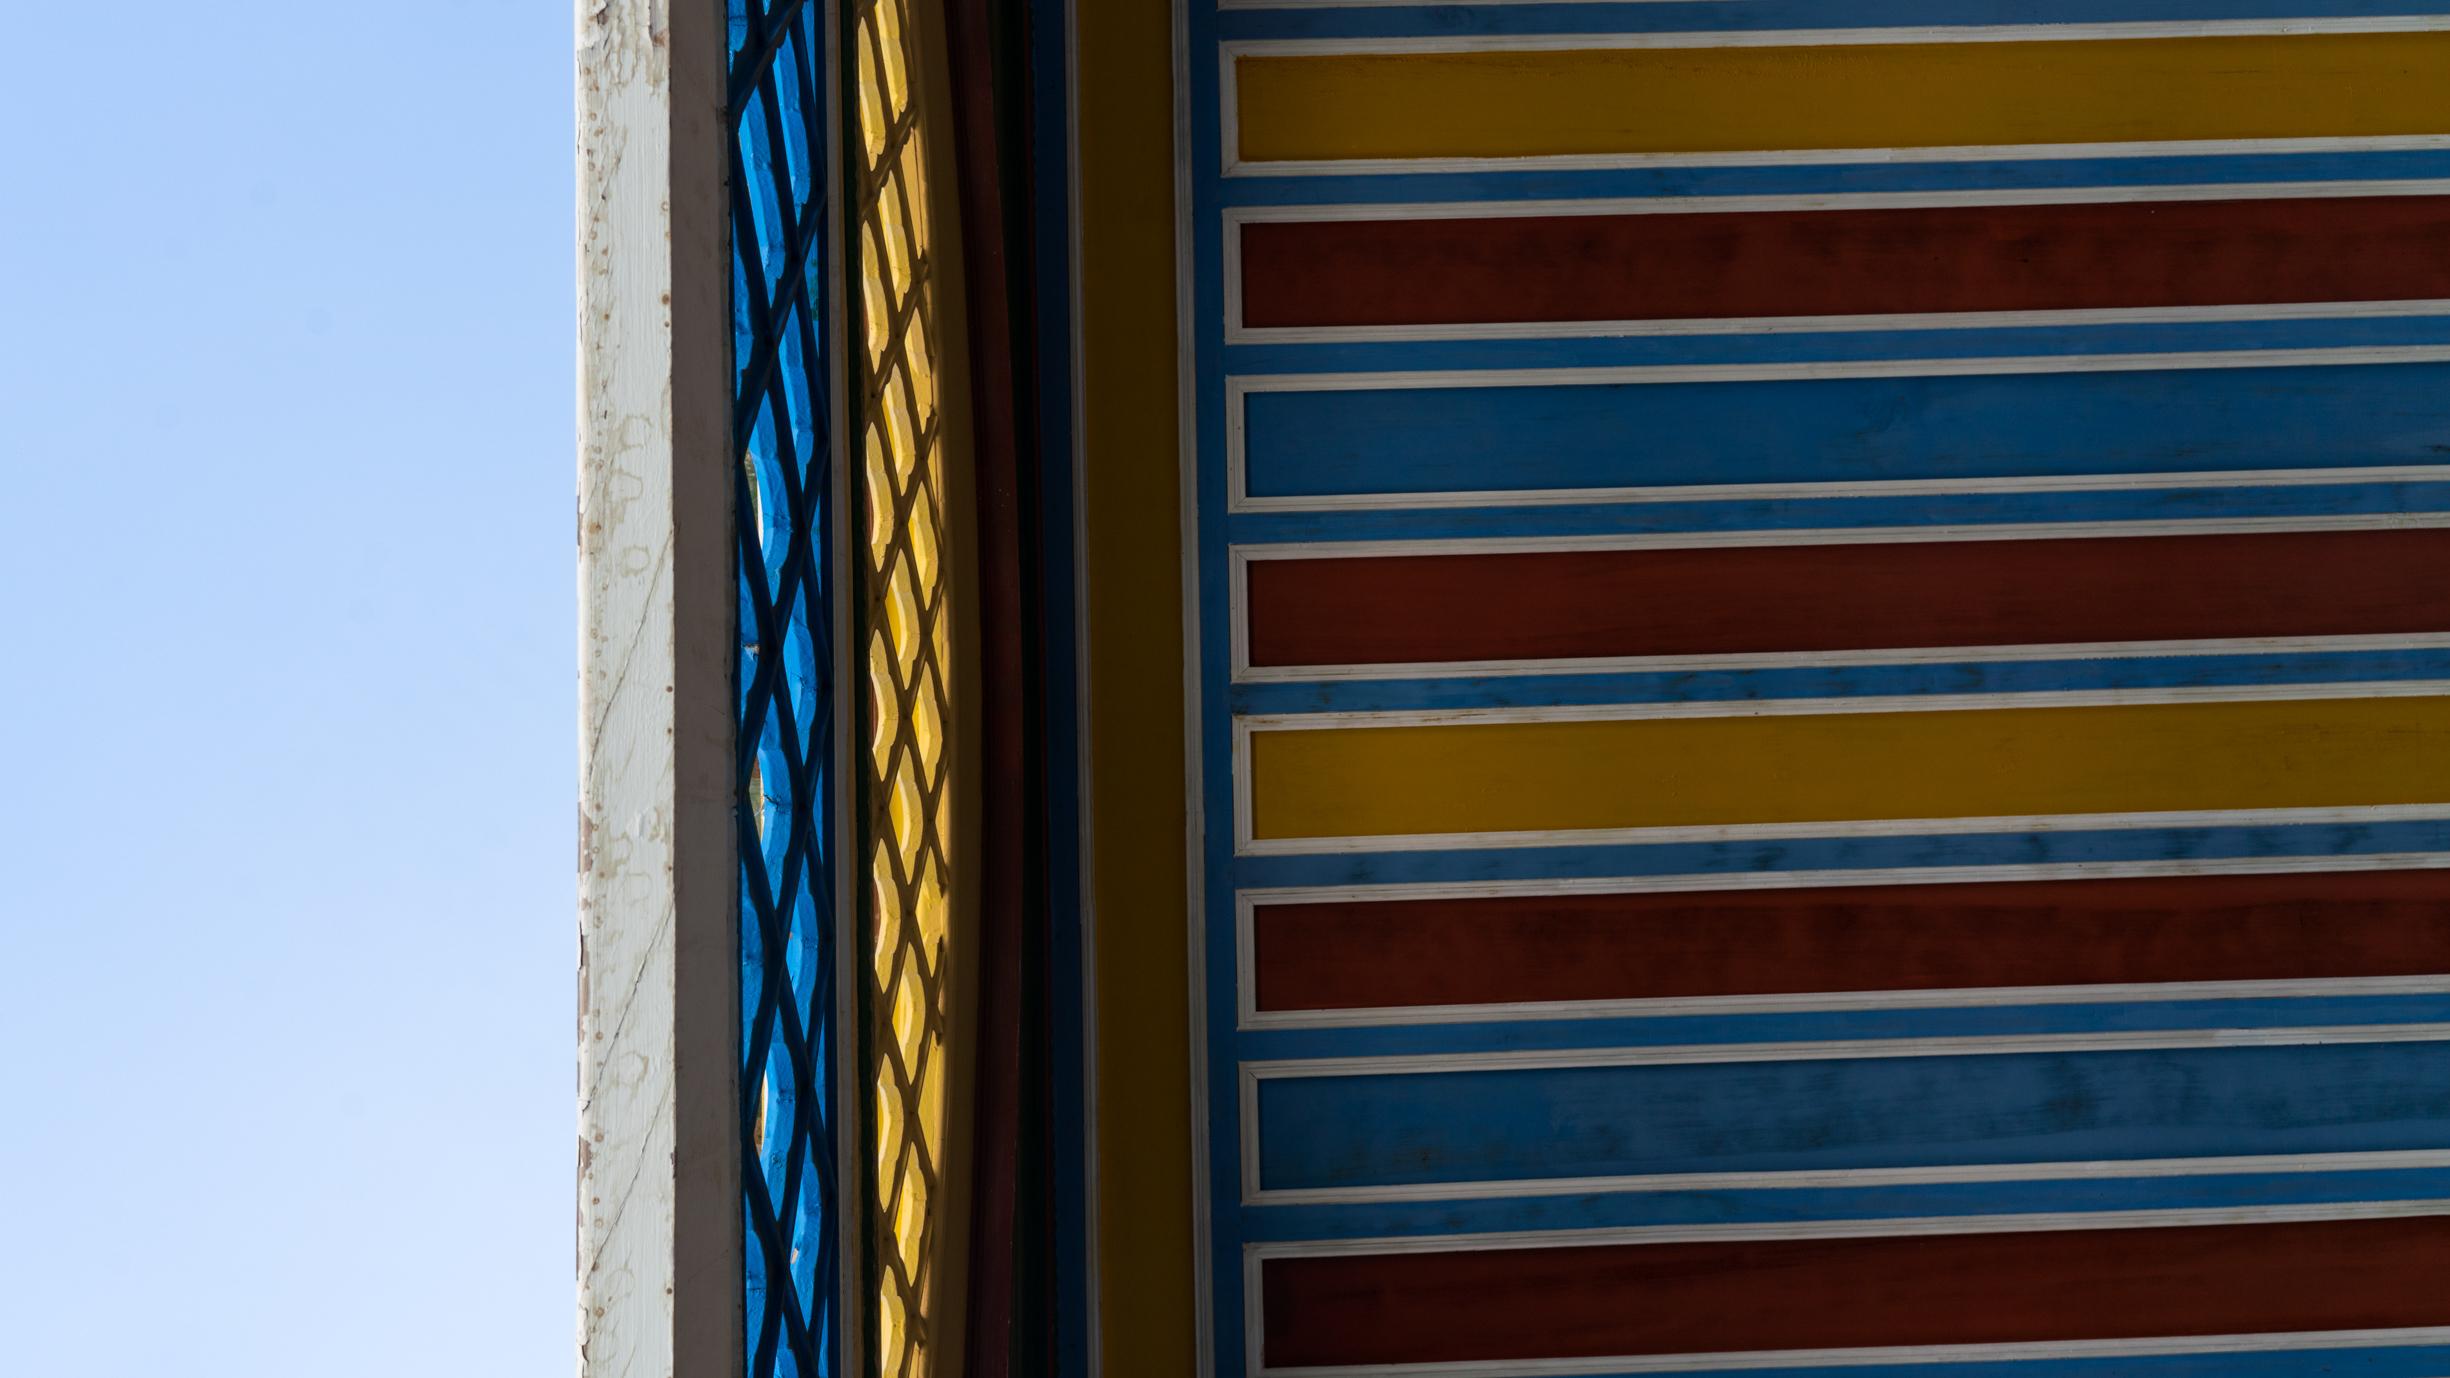 LB3-Morocco-0170.jpg